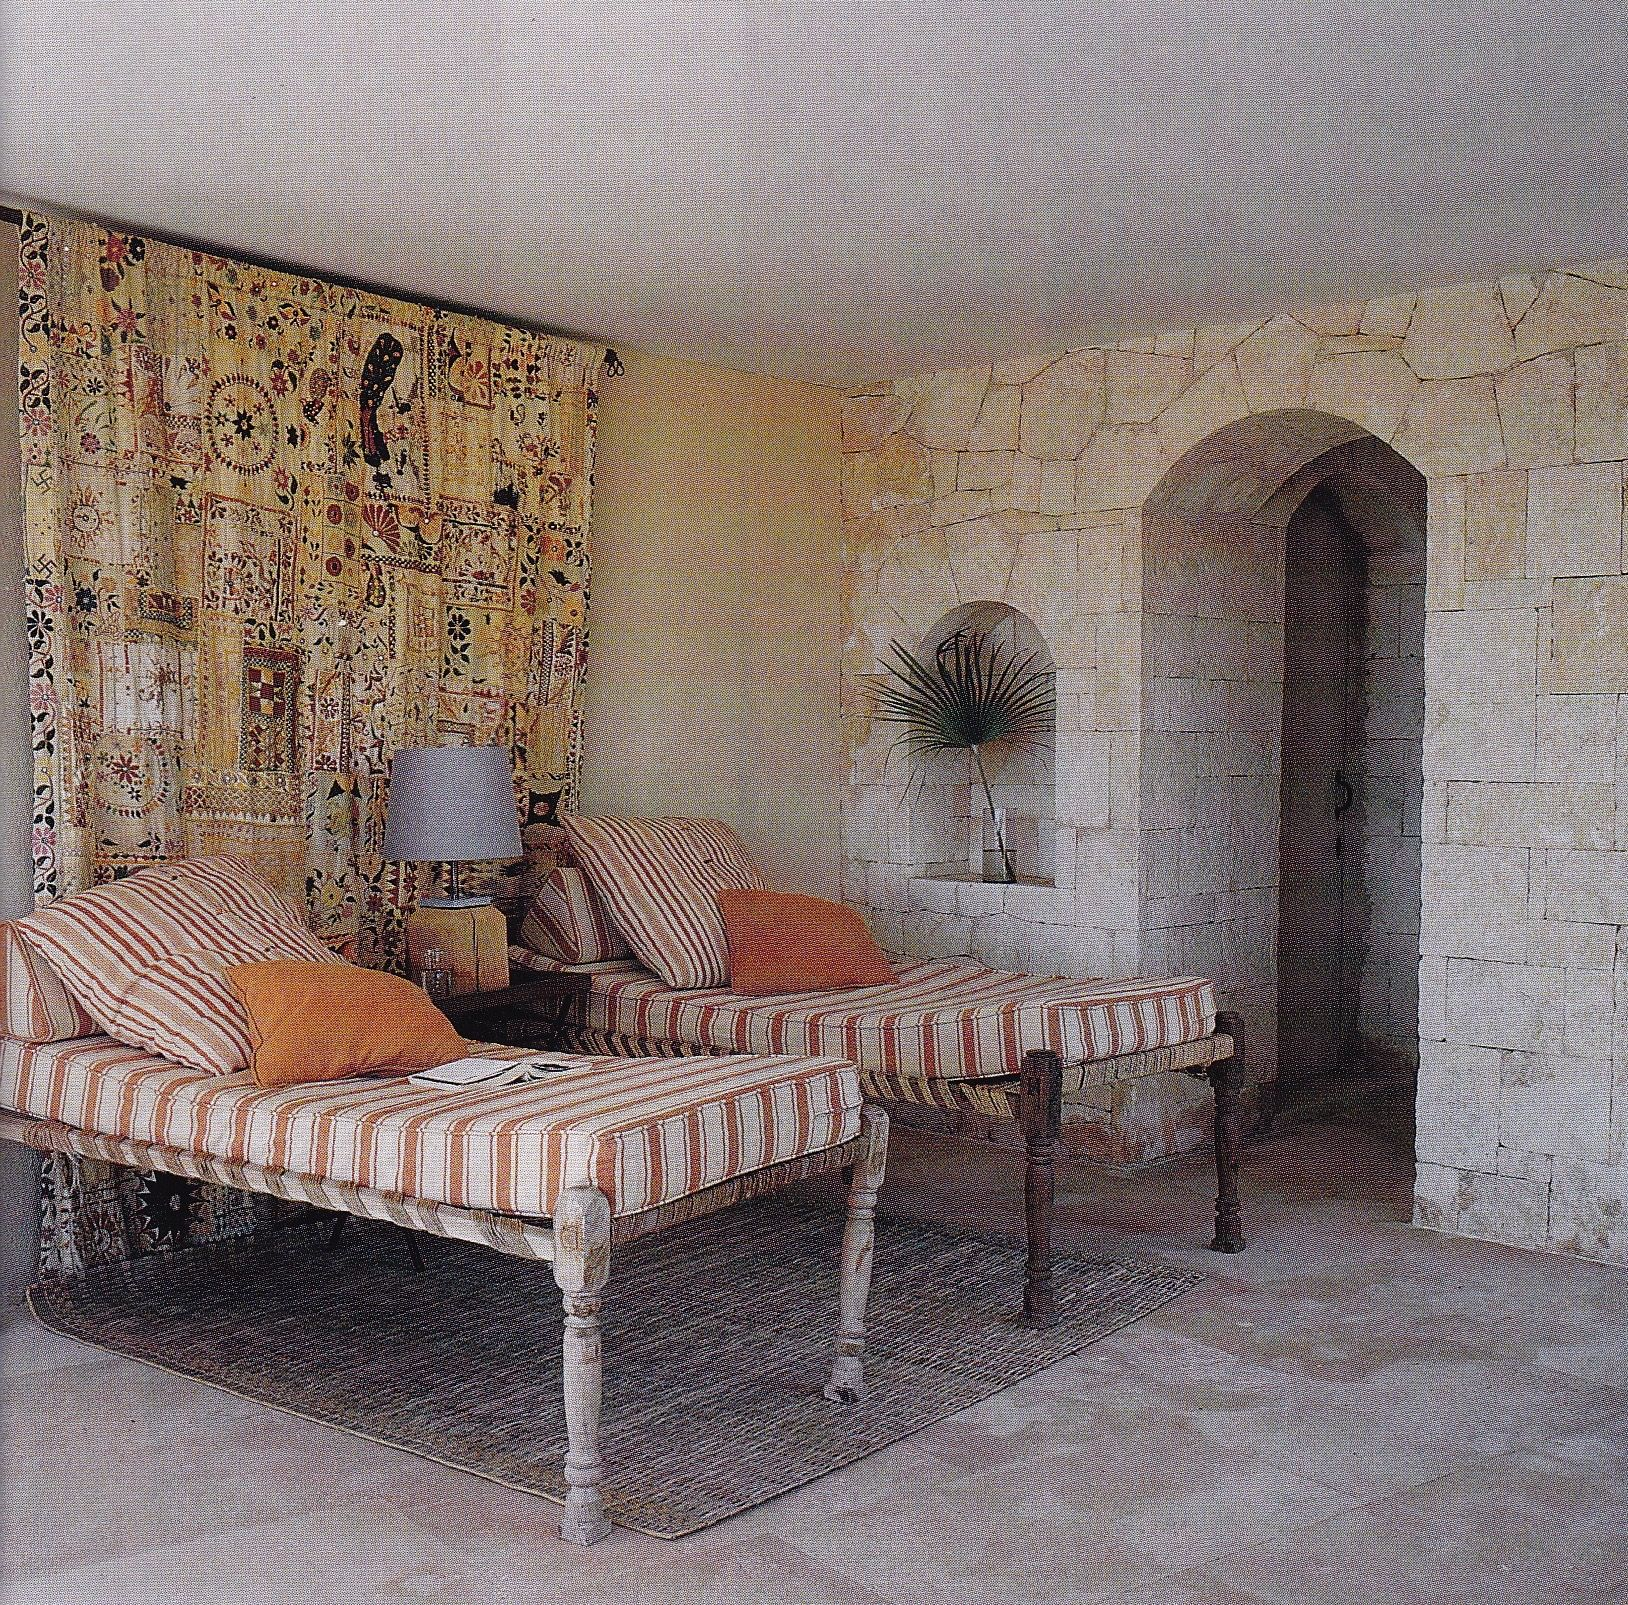 Peter Simon's Majorcan villa designed by Tino Zervudachi. Elle Decor